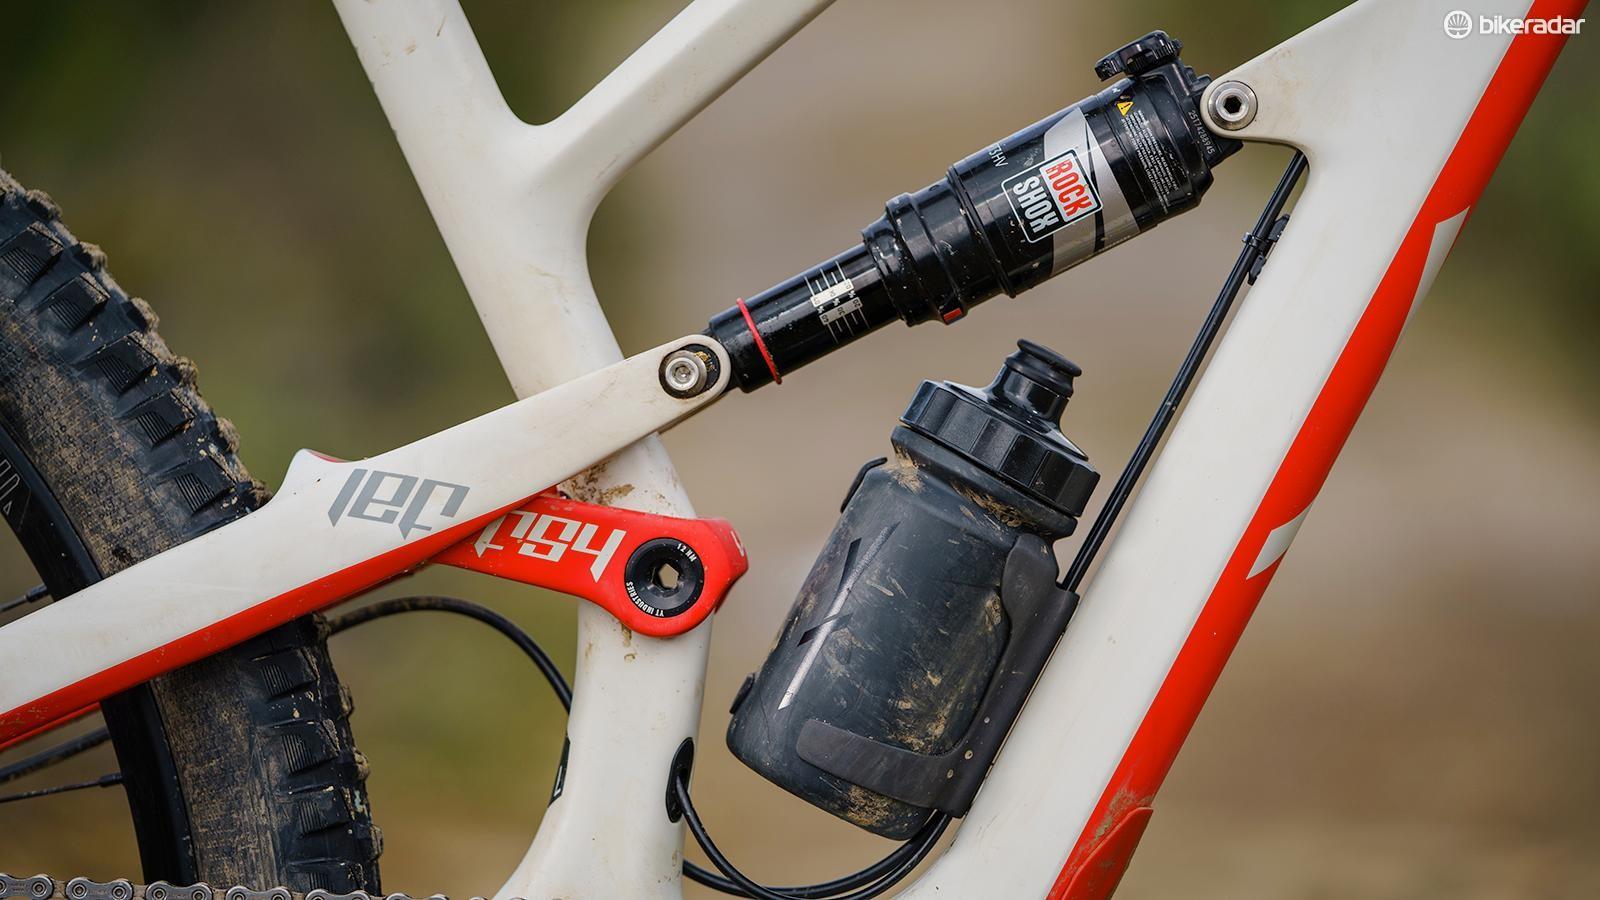 YT Jeffsy 29 CF review - BikeRadar